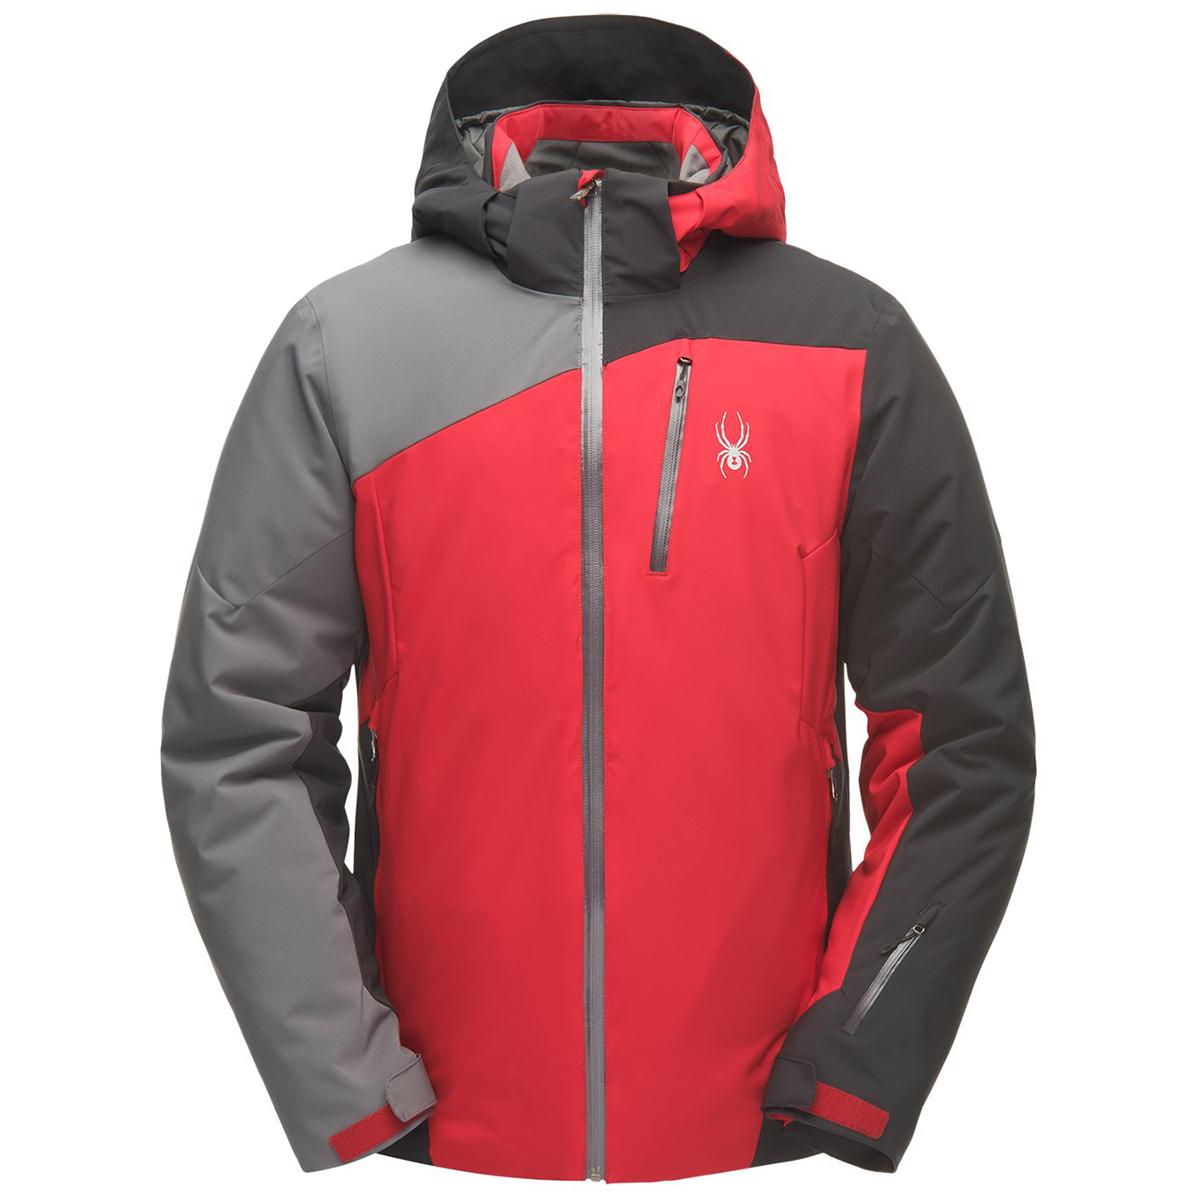 Spyder Men's Copper Gtx Ski Jacket - Red, XL